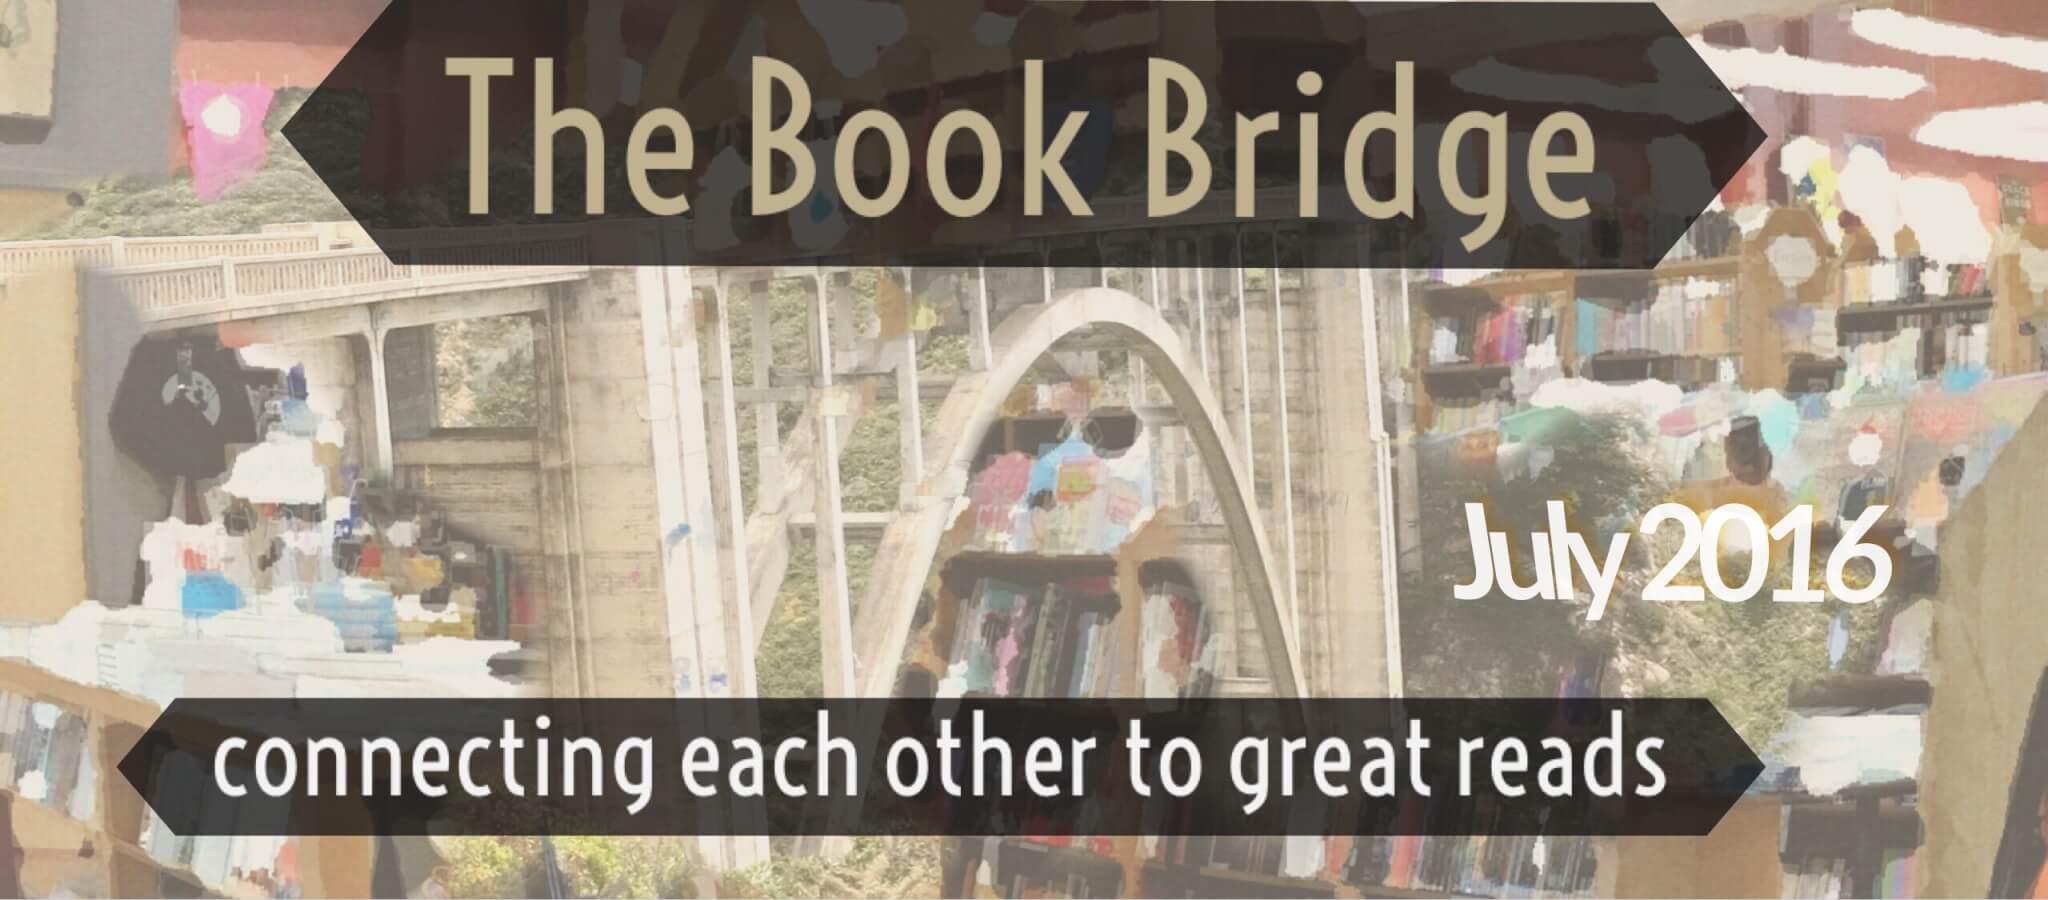 The Book Bridge July 2016 Edition